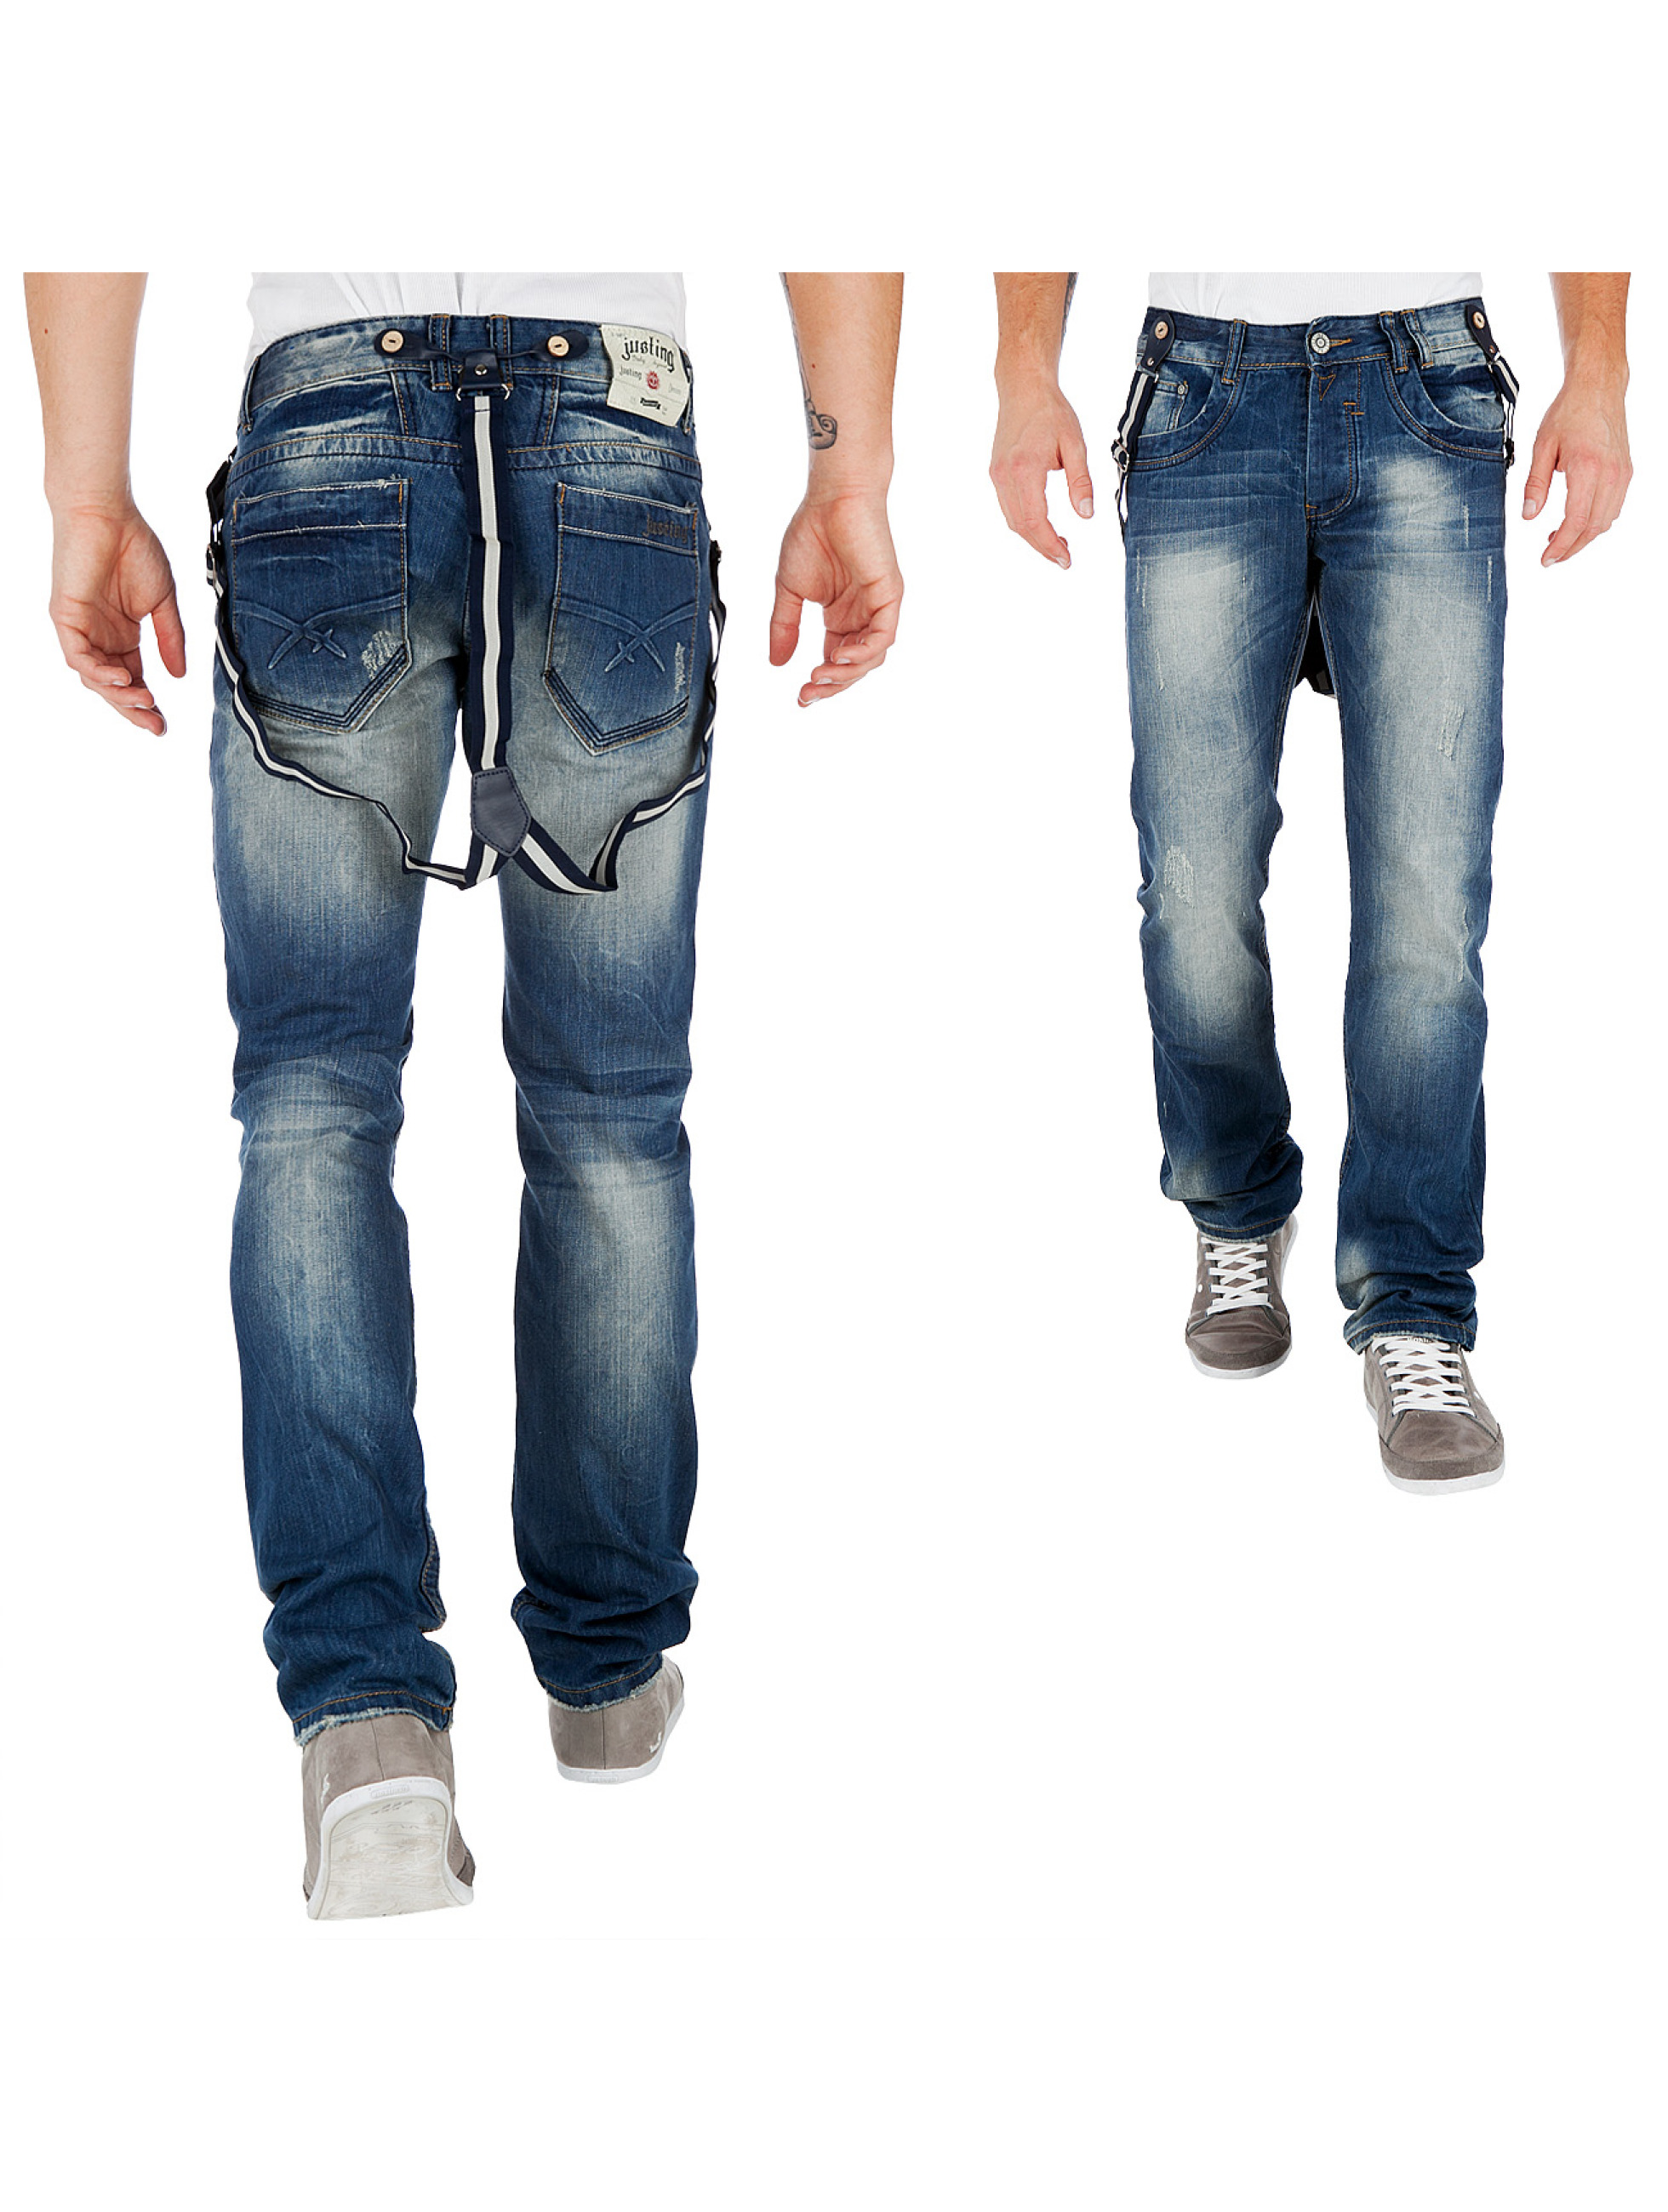 Justing Jeans Braces Jeans Light Blue